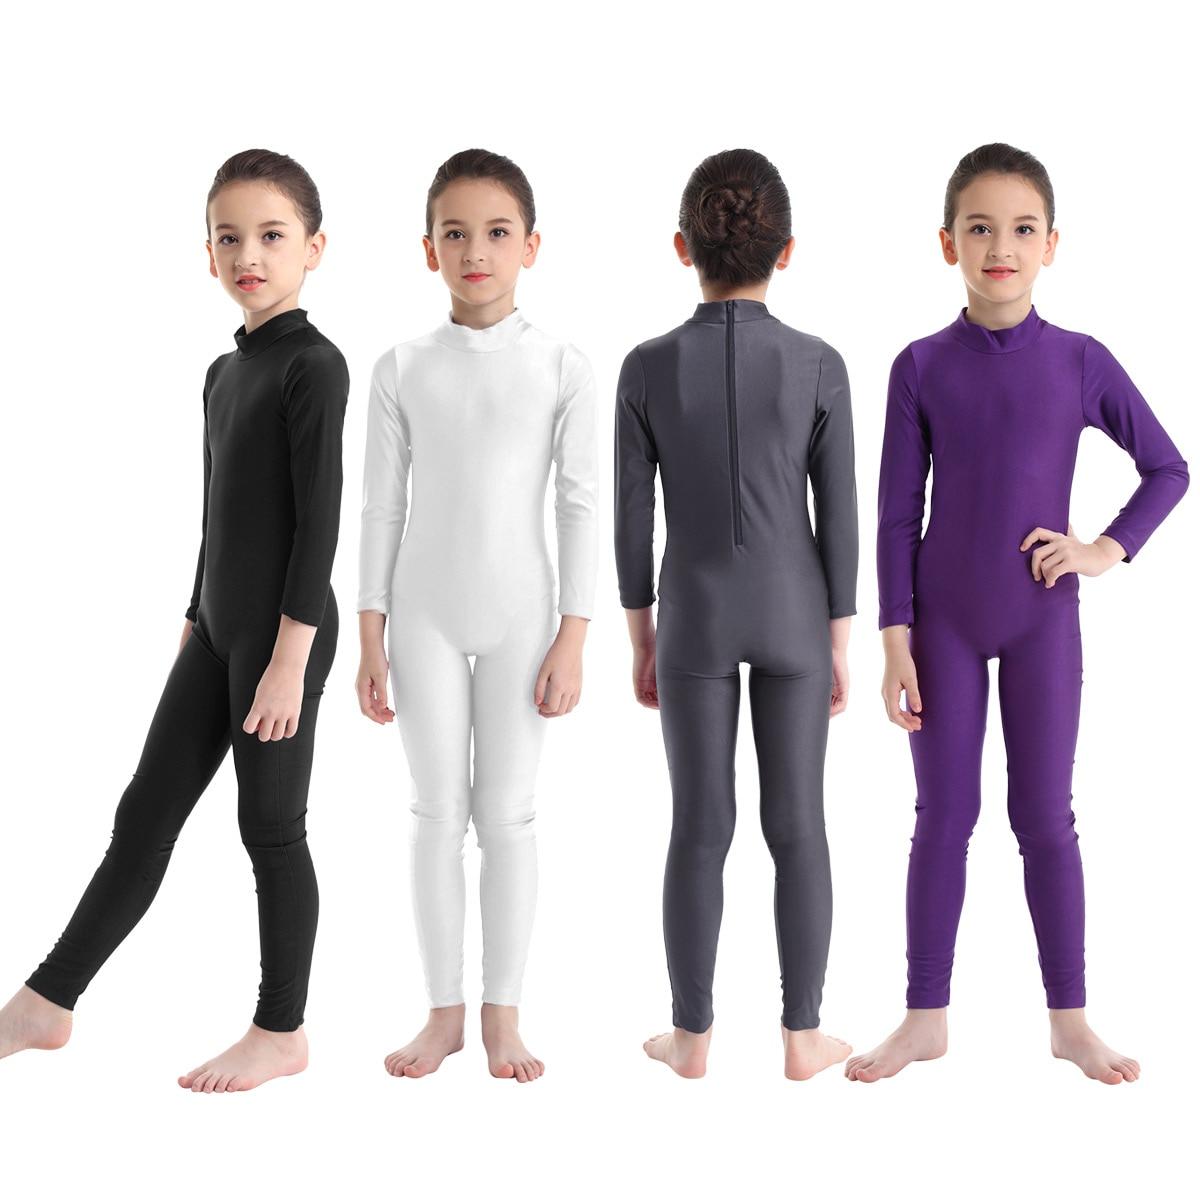 TiaoBug niños de manga larga con cremallera profesional Ballet traje leotardo gimnasia danza desgaste niños niñas acrobacias gimnasio Unitards